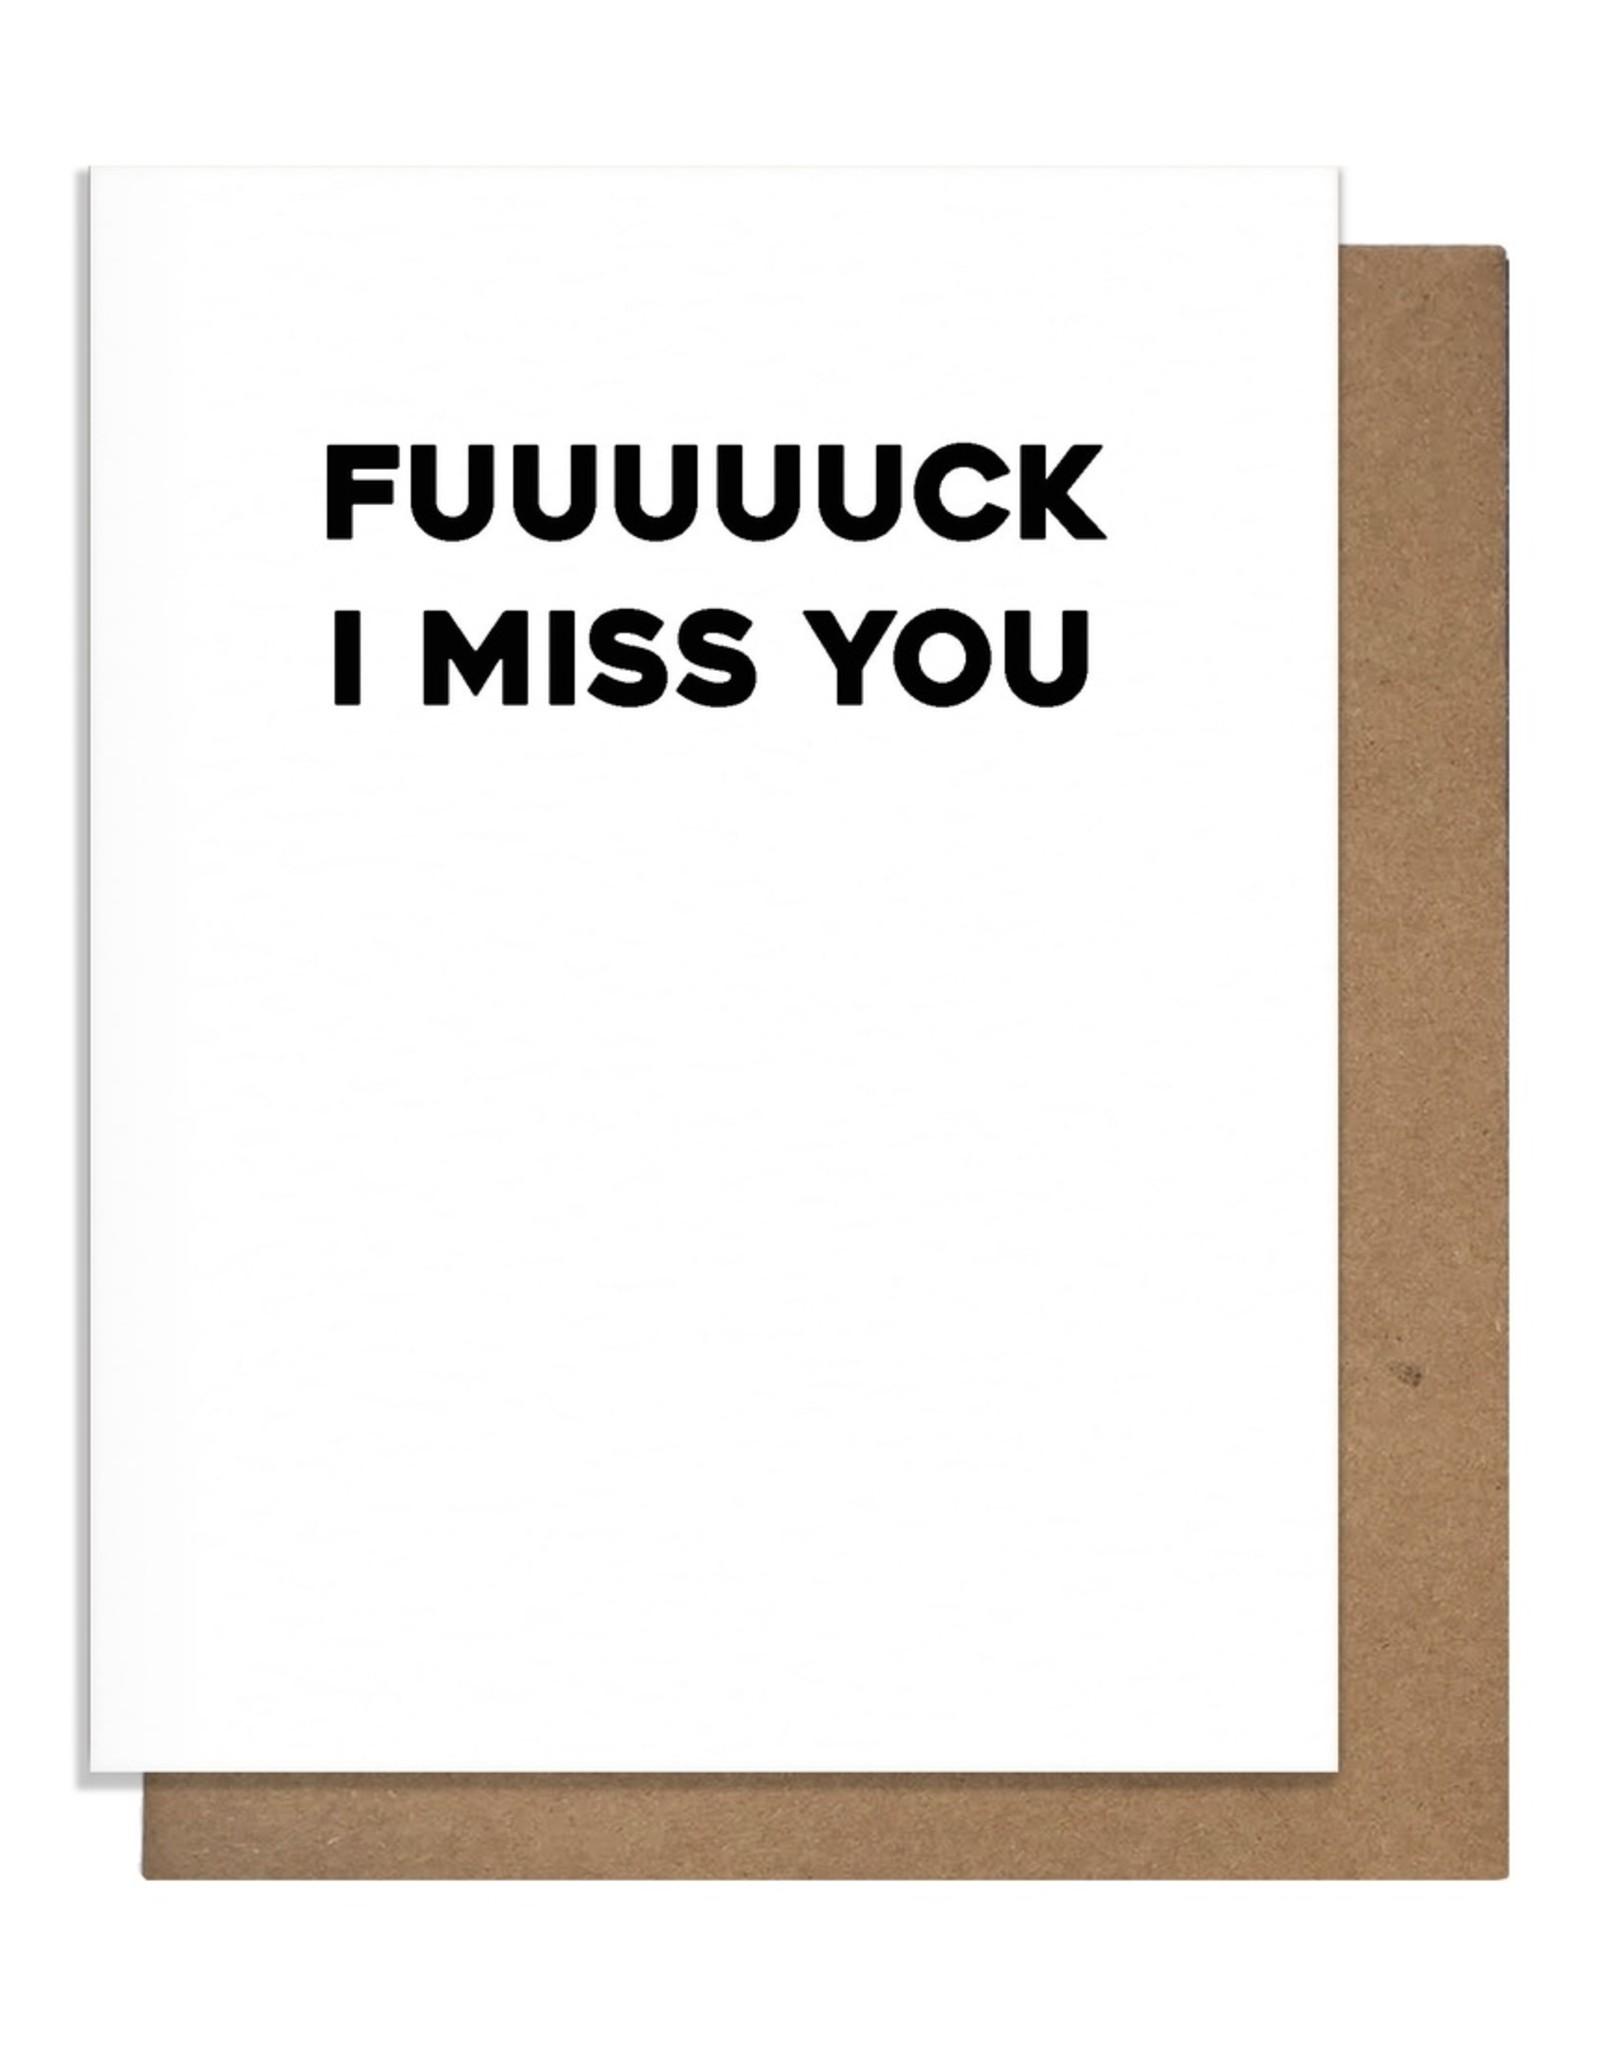 Matt Butler LLC dba Pretty Alright Goods Card - Blank: Fuuuuck I miss you